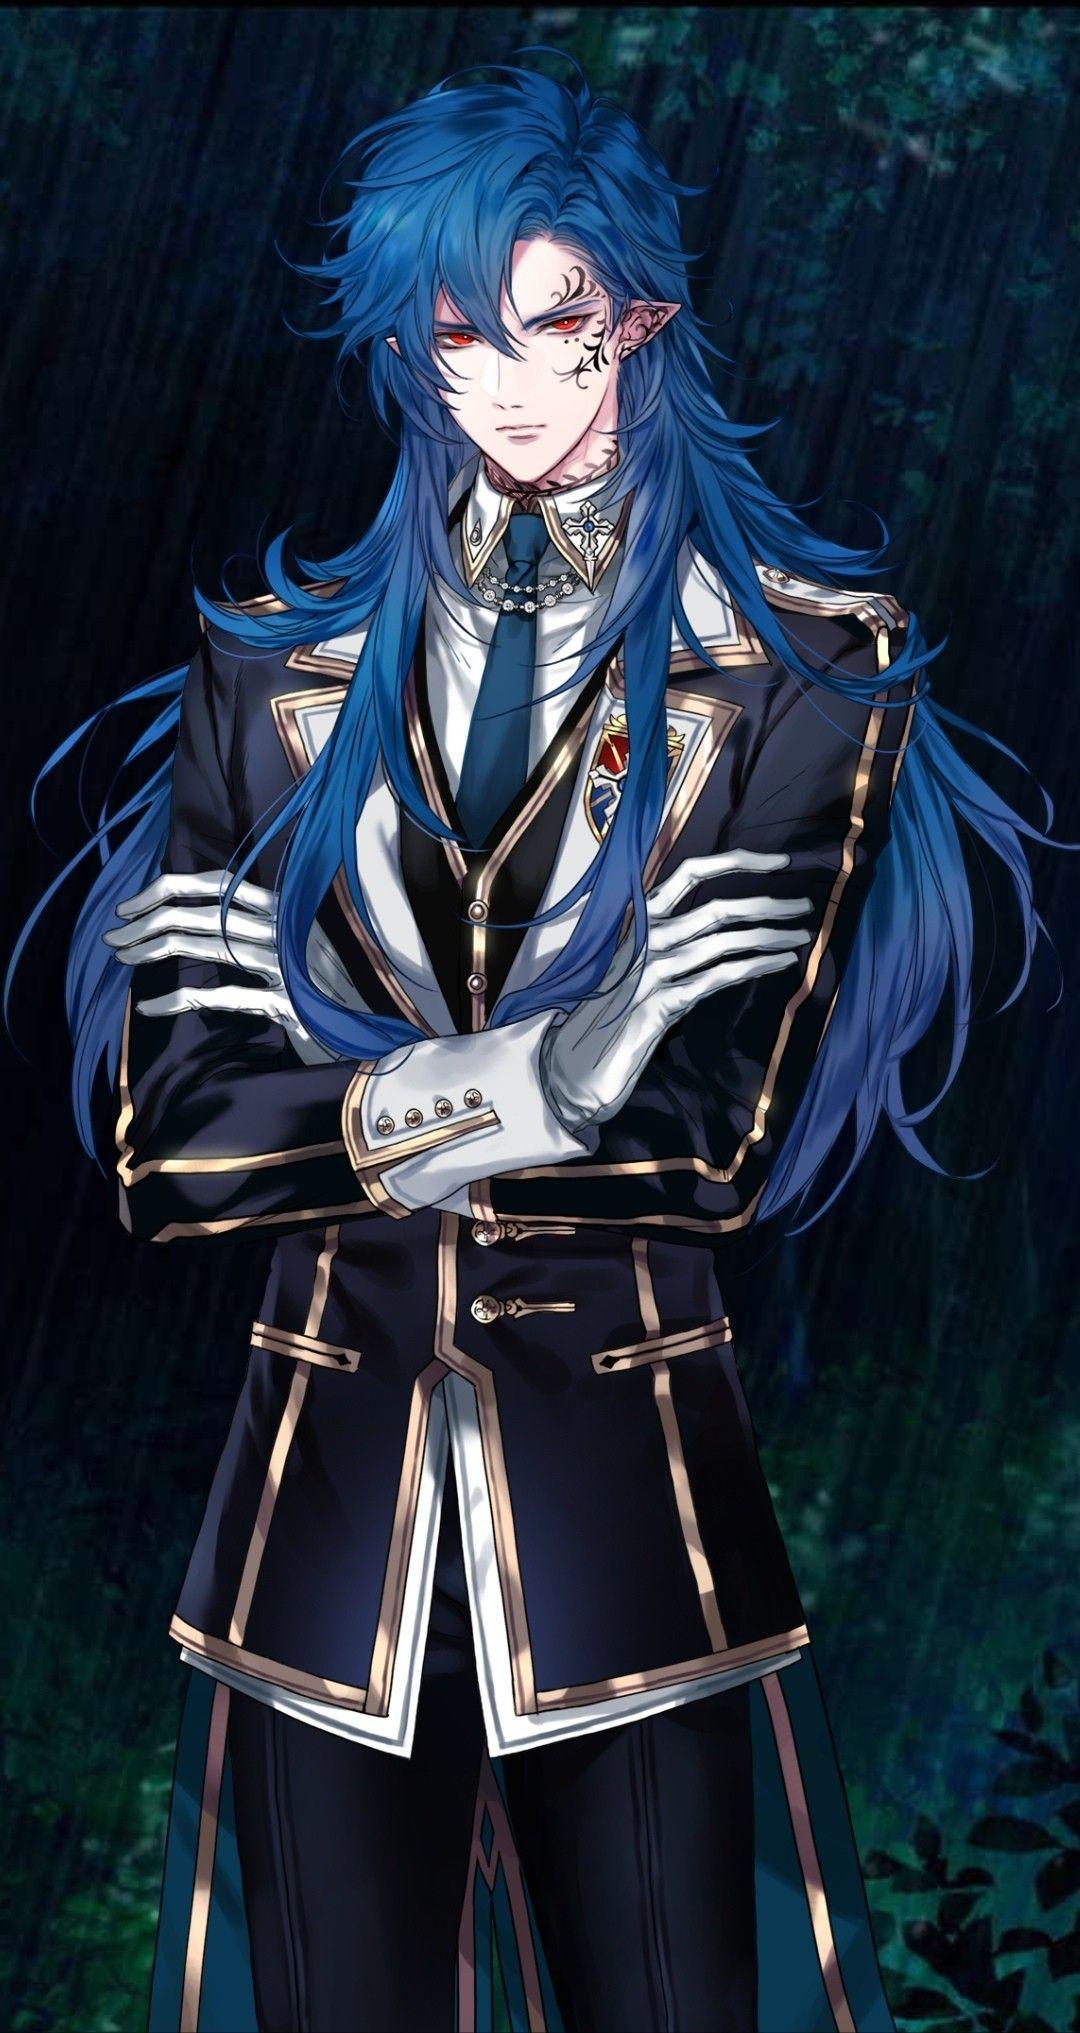 Vampire Handsome Anime Guys Cute Anime Guys Handsome Anime Anime vampire wallpapers for android